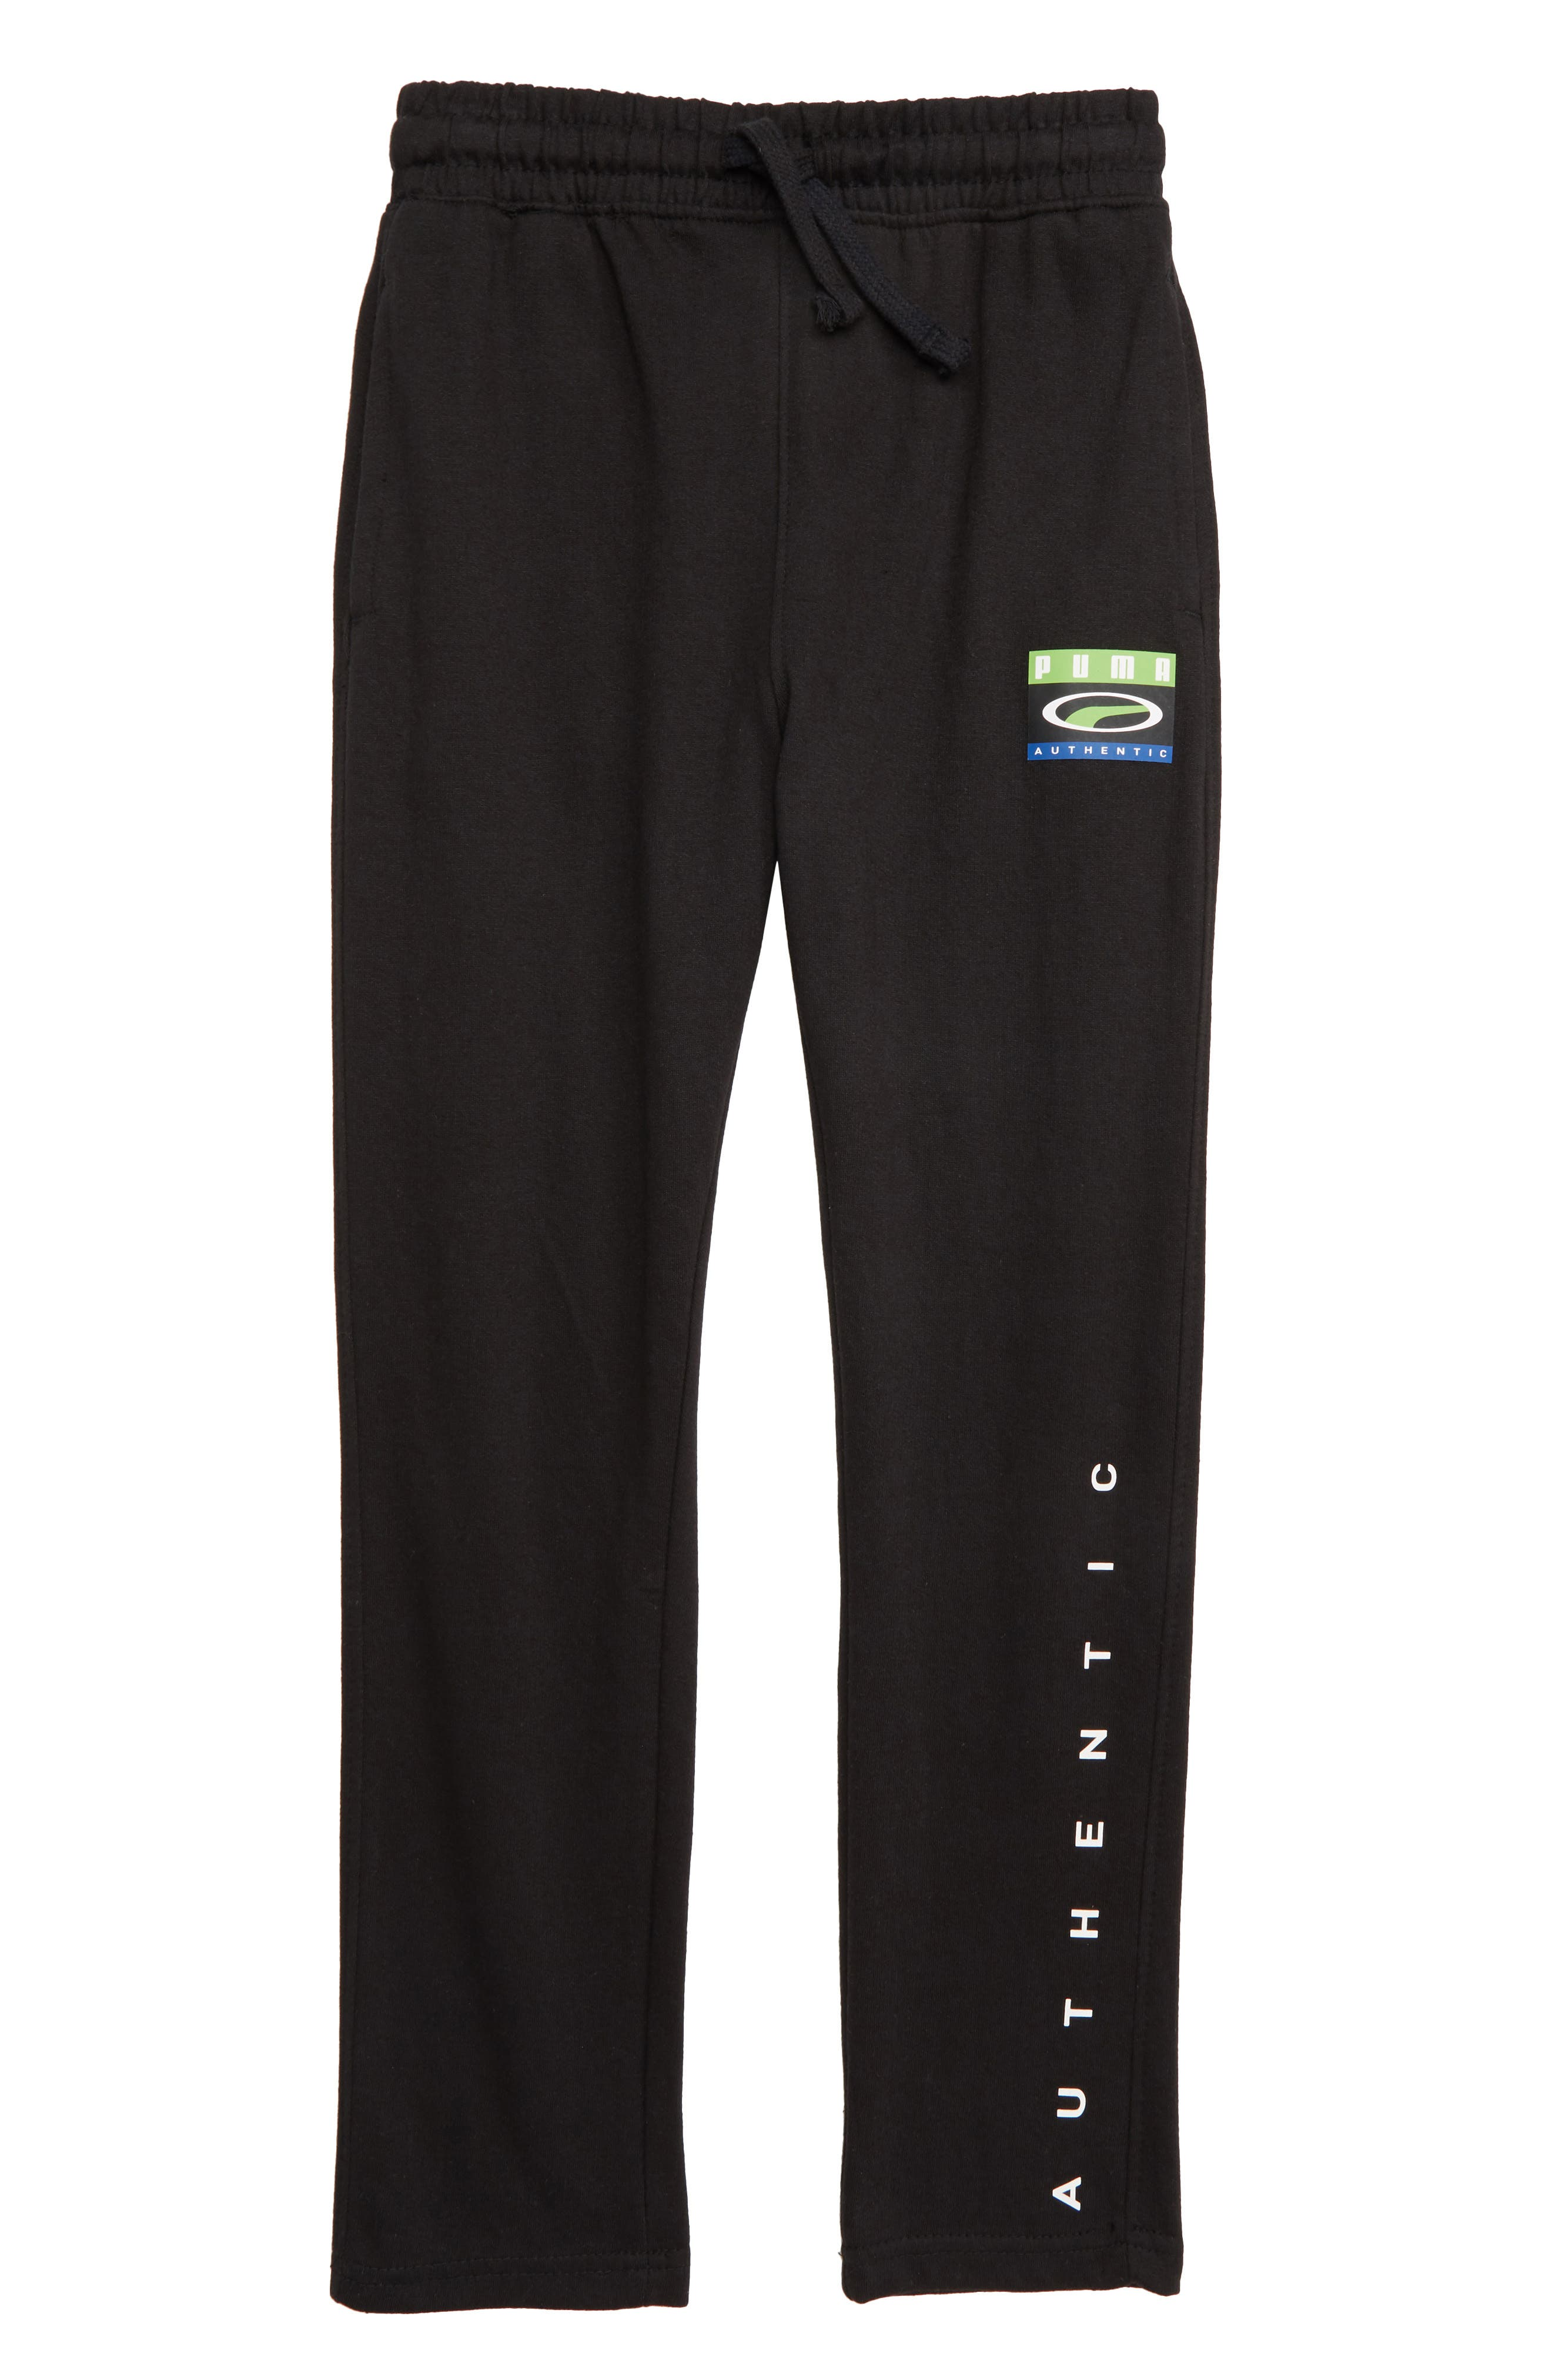 PUMA,                             Cotton Fleece Tapered Pants,                             Main thumbnail 1, color,                             PUMA BLACK